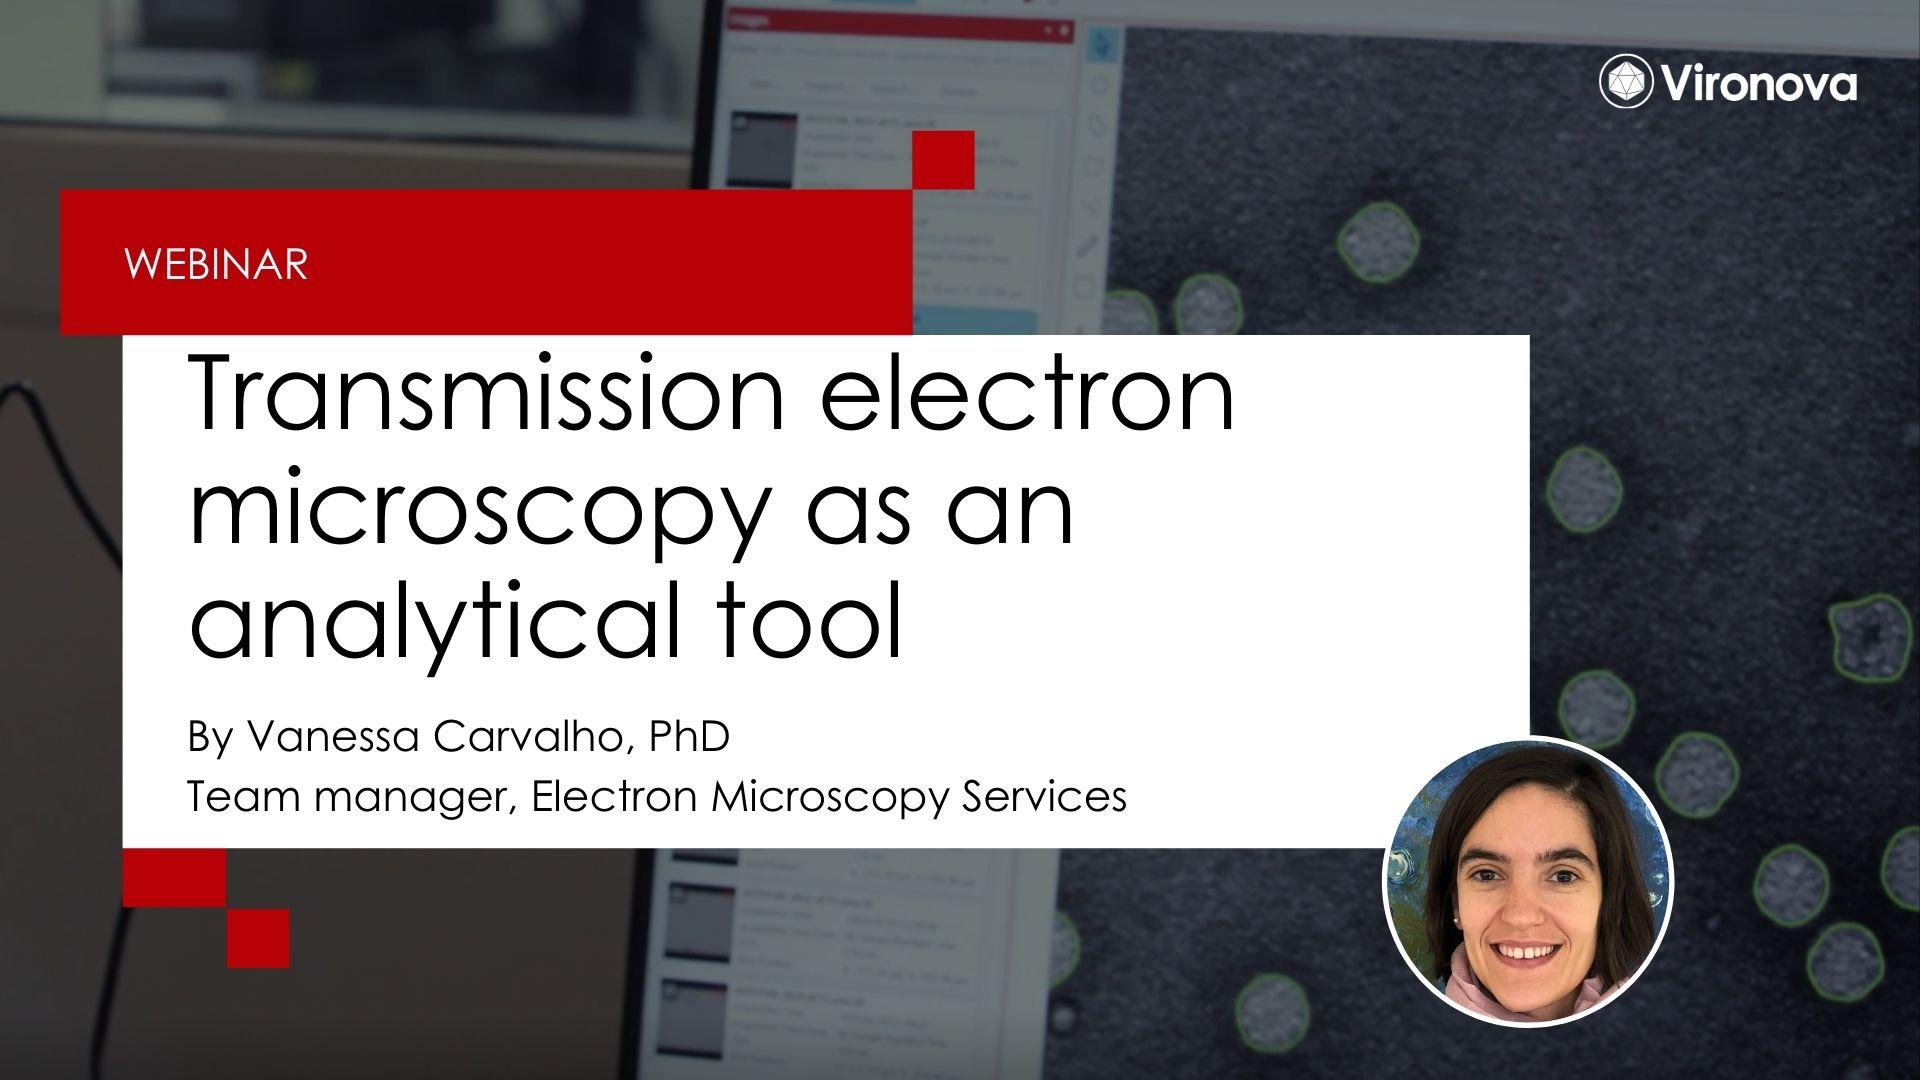 bpi-2021-transmission-electron-microscopy-analytical-tool-vanessa